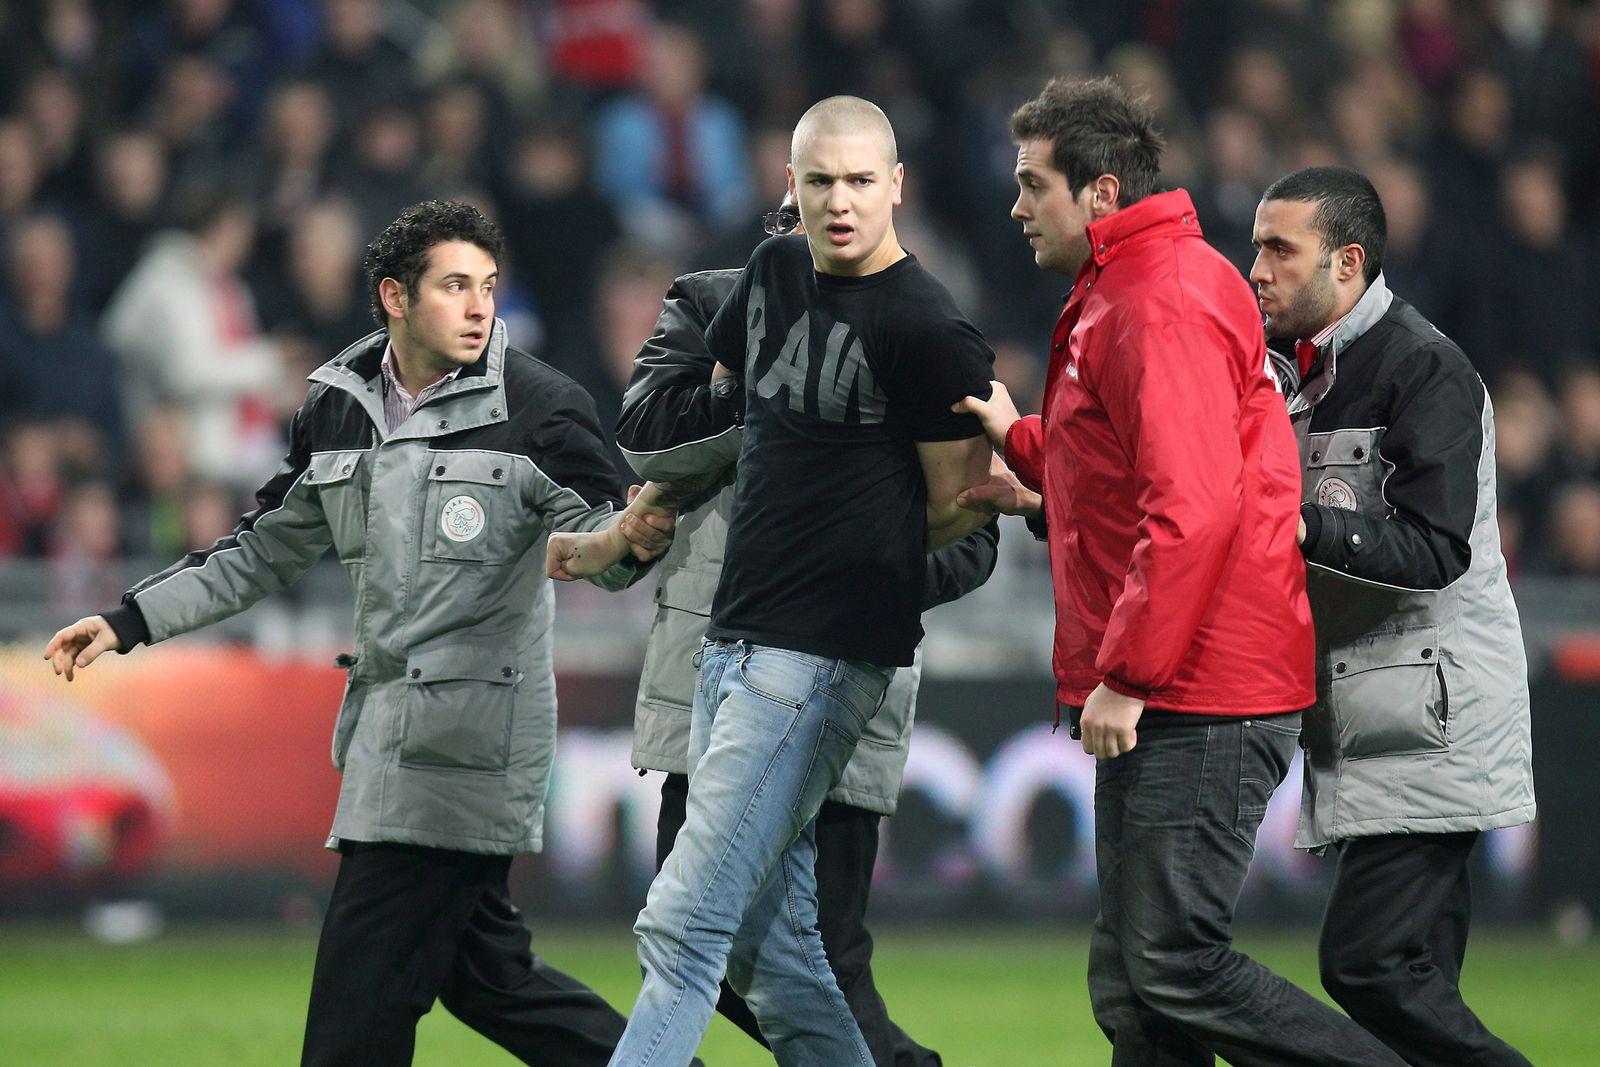 Dutch Cup - Ajax Amsterdam vs AZ Alkmaar